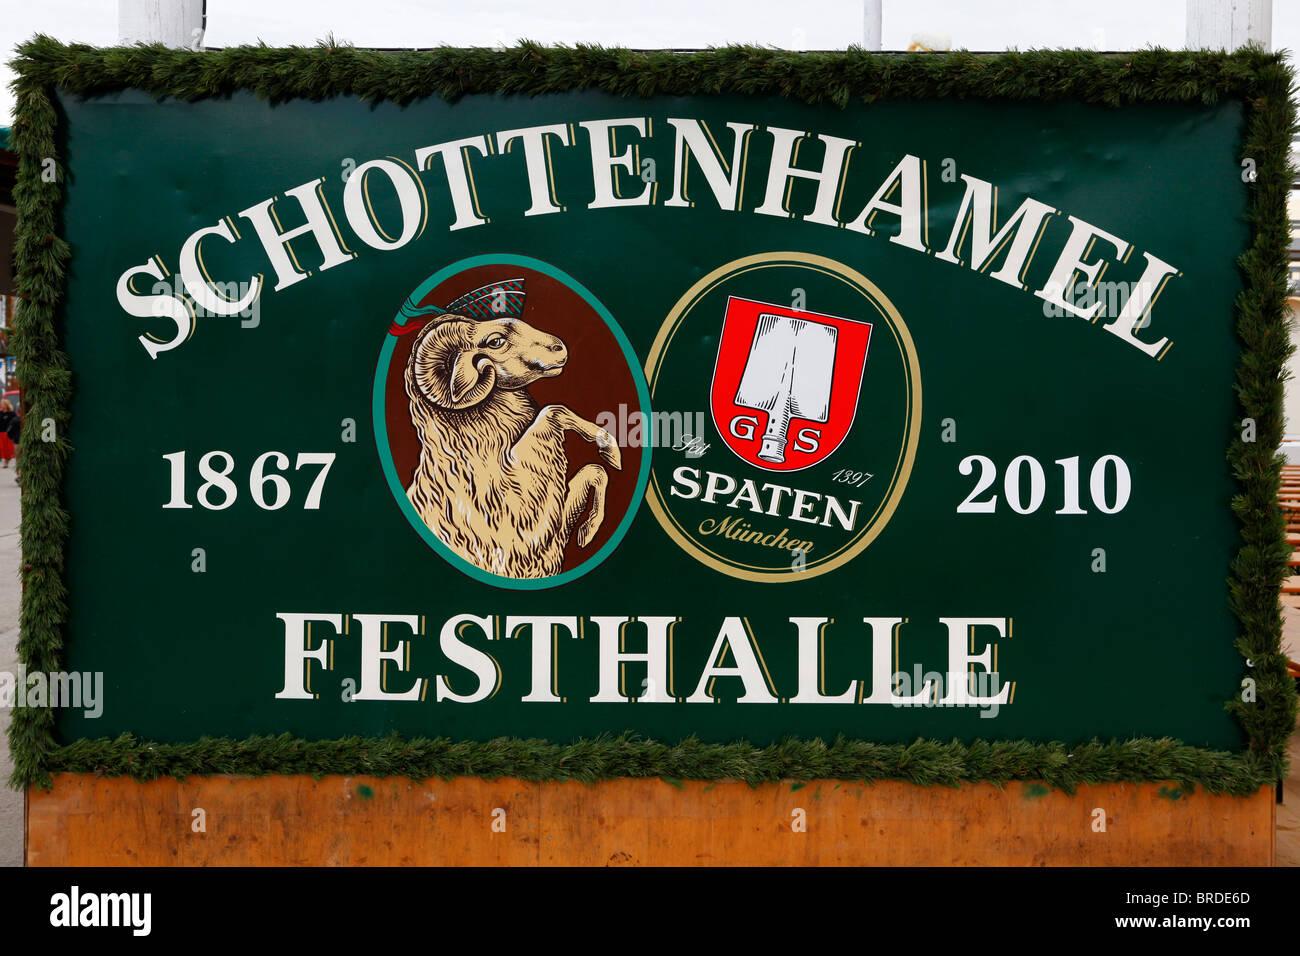 A sign for the Schottenhamel Festhalle at the 2010 Munich Oktoberfest. Stock Photo